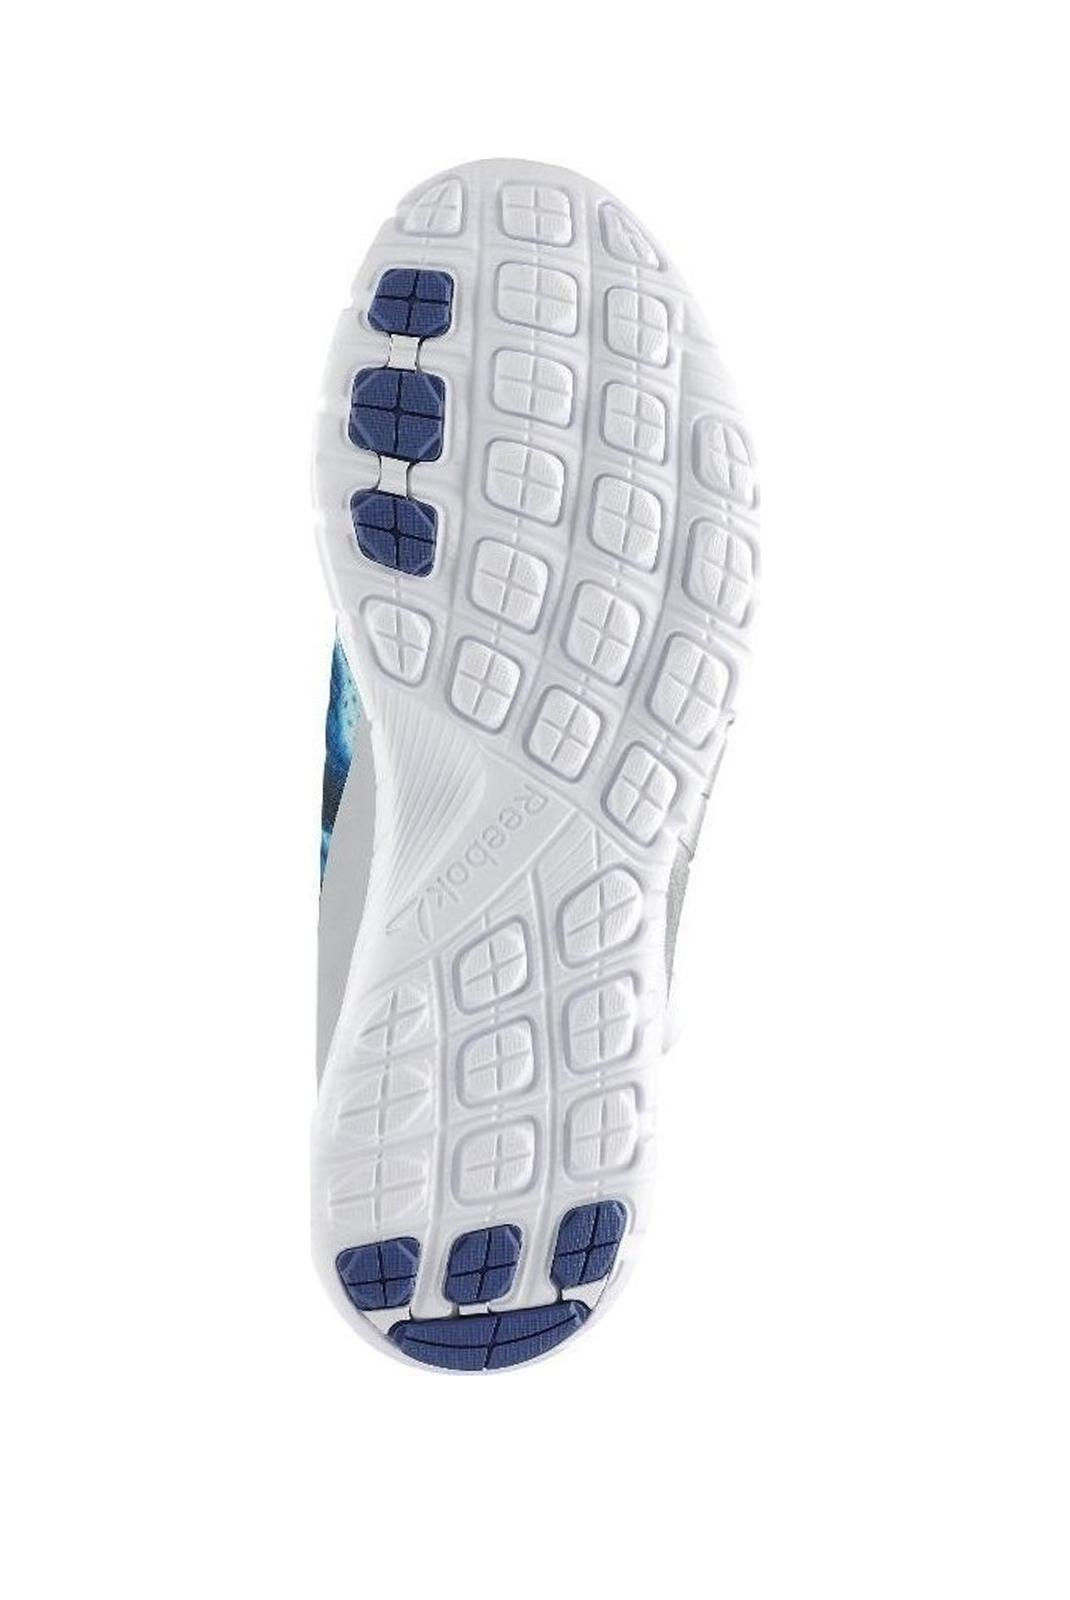 Baskets / Sport  Reebok V72616 ZPUMP FUSION 2.0 DUNES BLUE